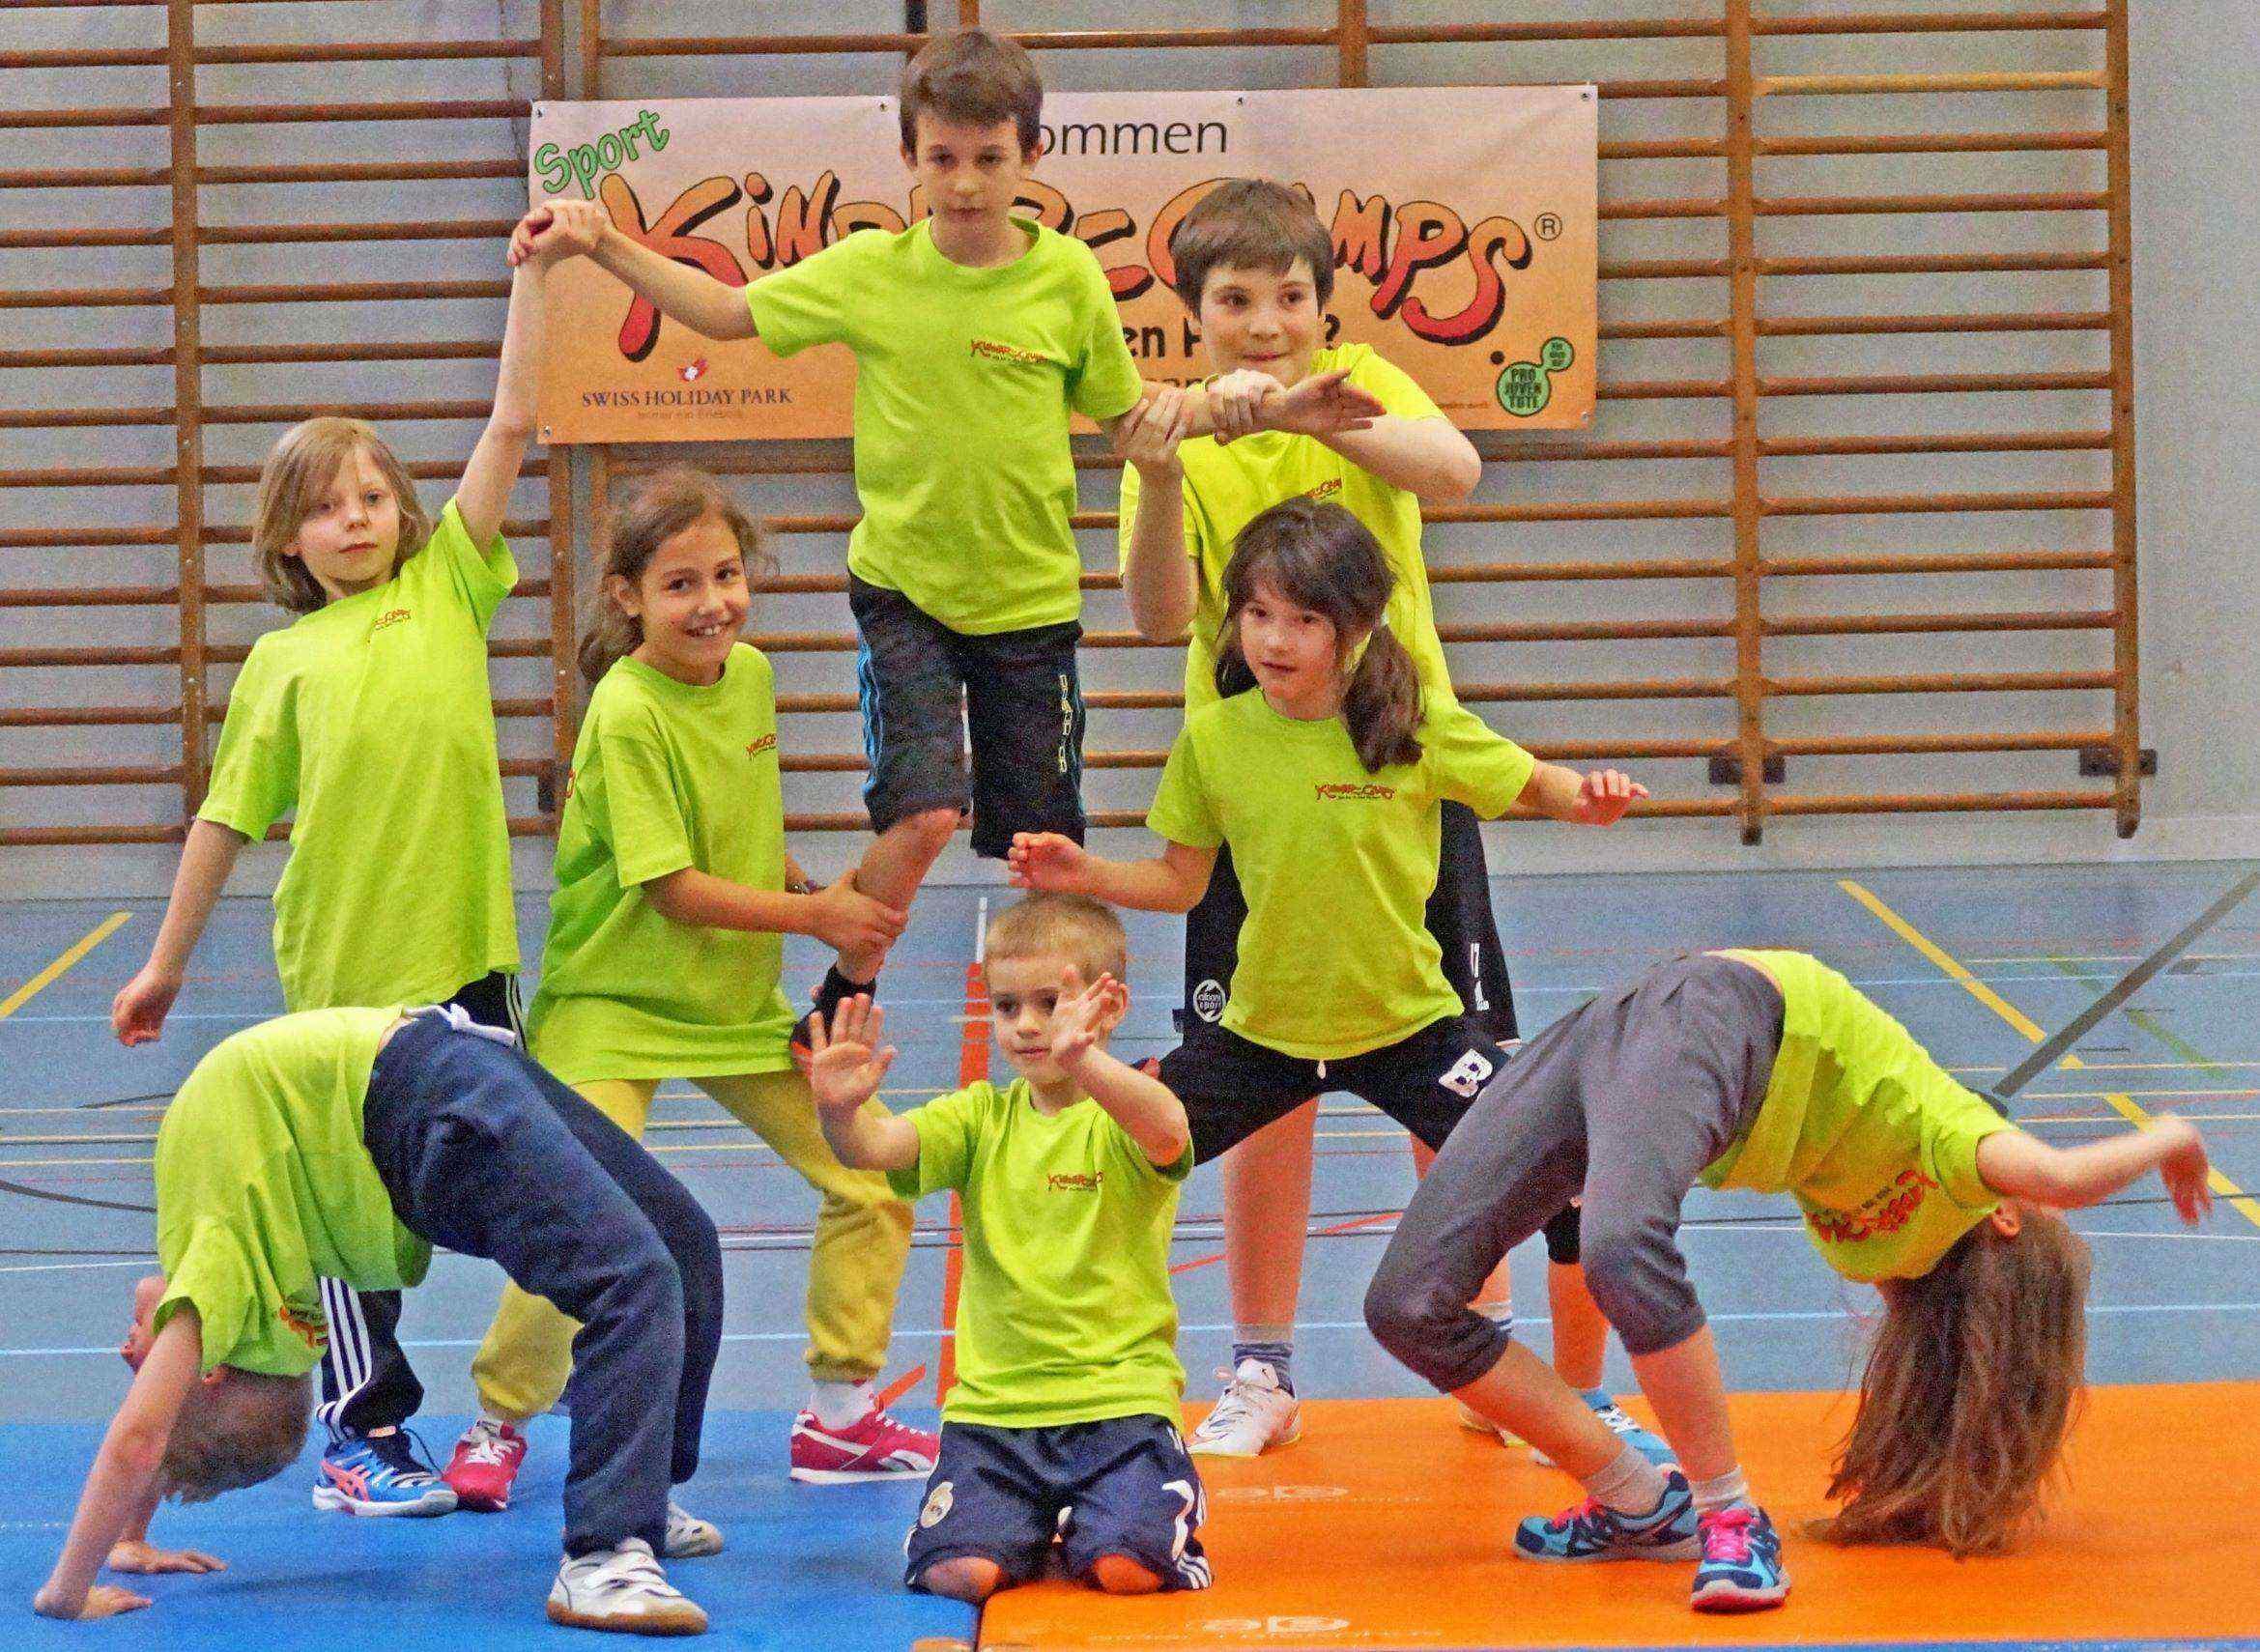 Verein Kinder-Camps